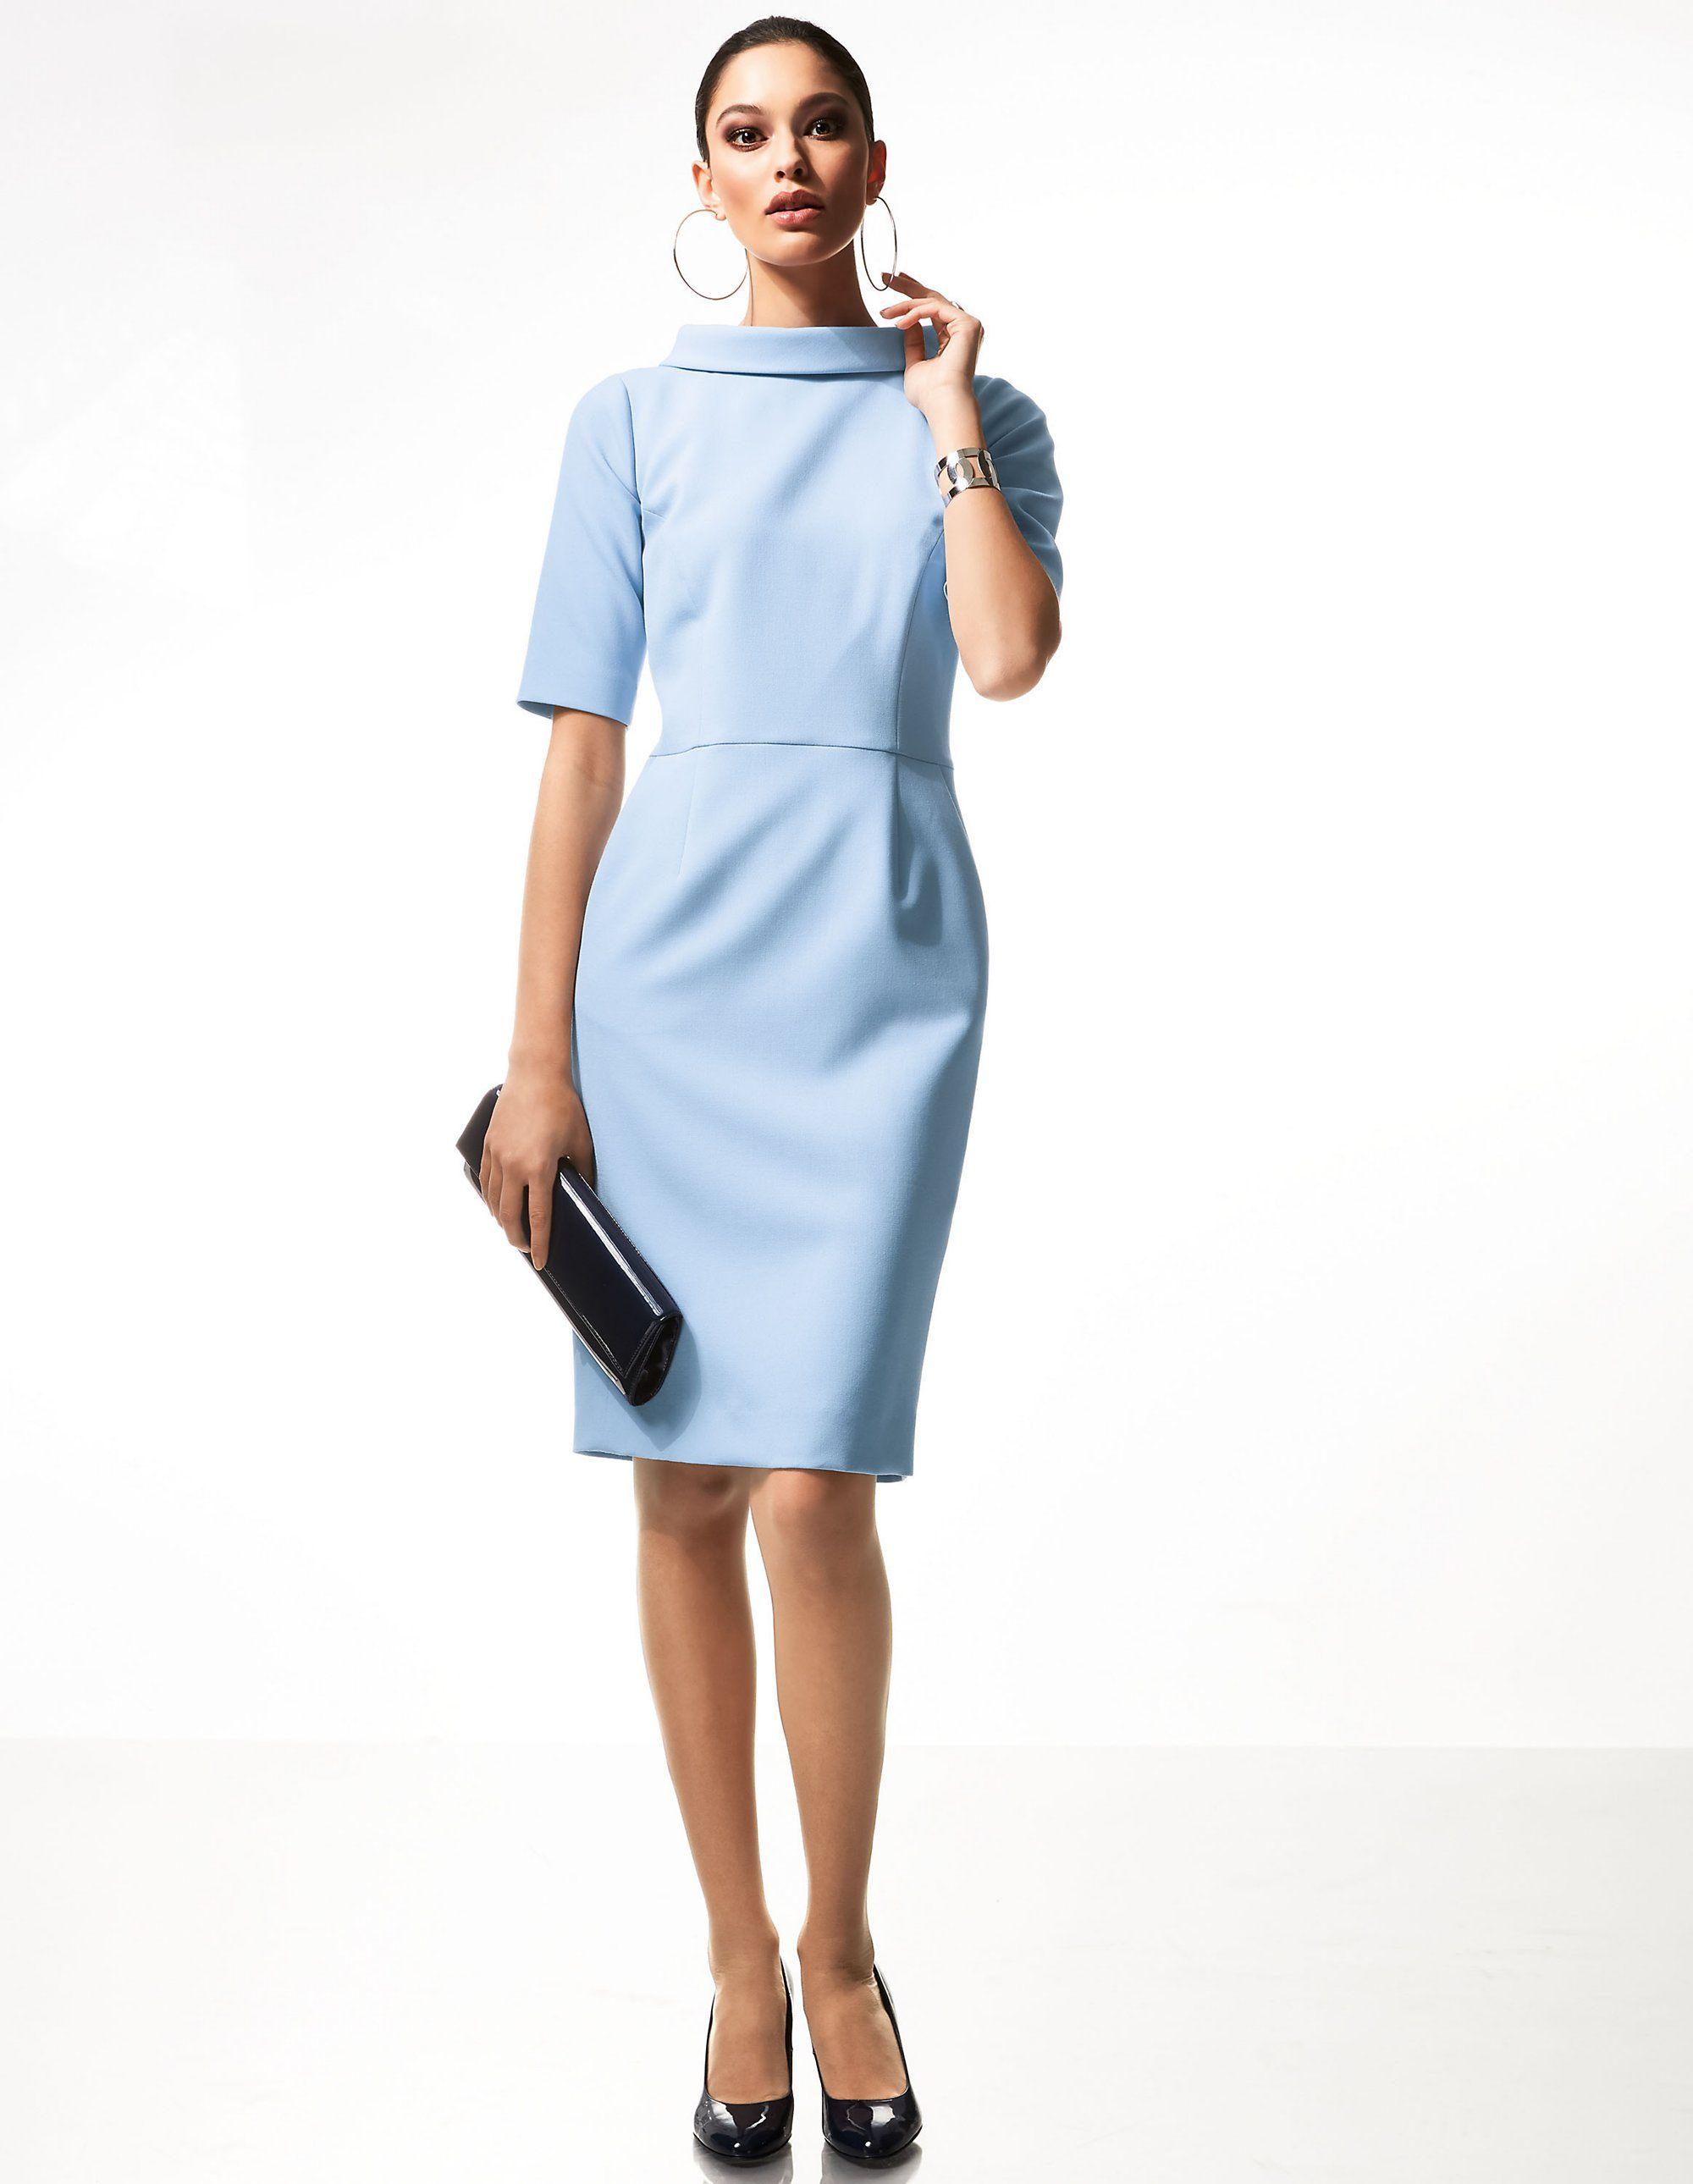 Dress | MADELEINE Fashion | Vestidos | Pinterest | Dresses ...